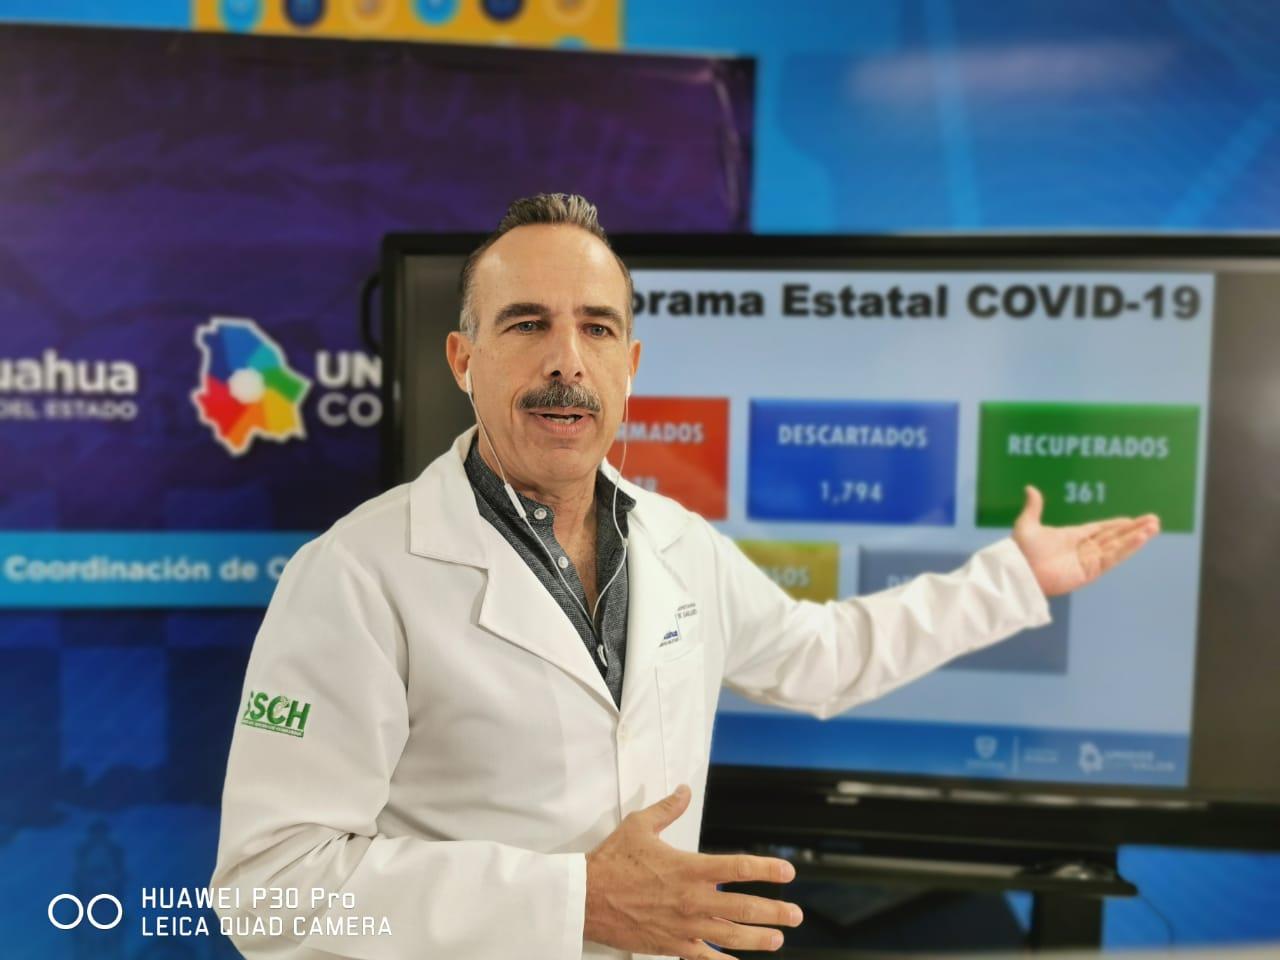 Llega Chihuahua a los mil 279 casos confirmados de COVID-19